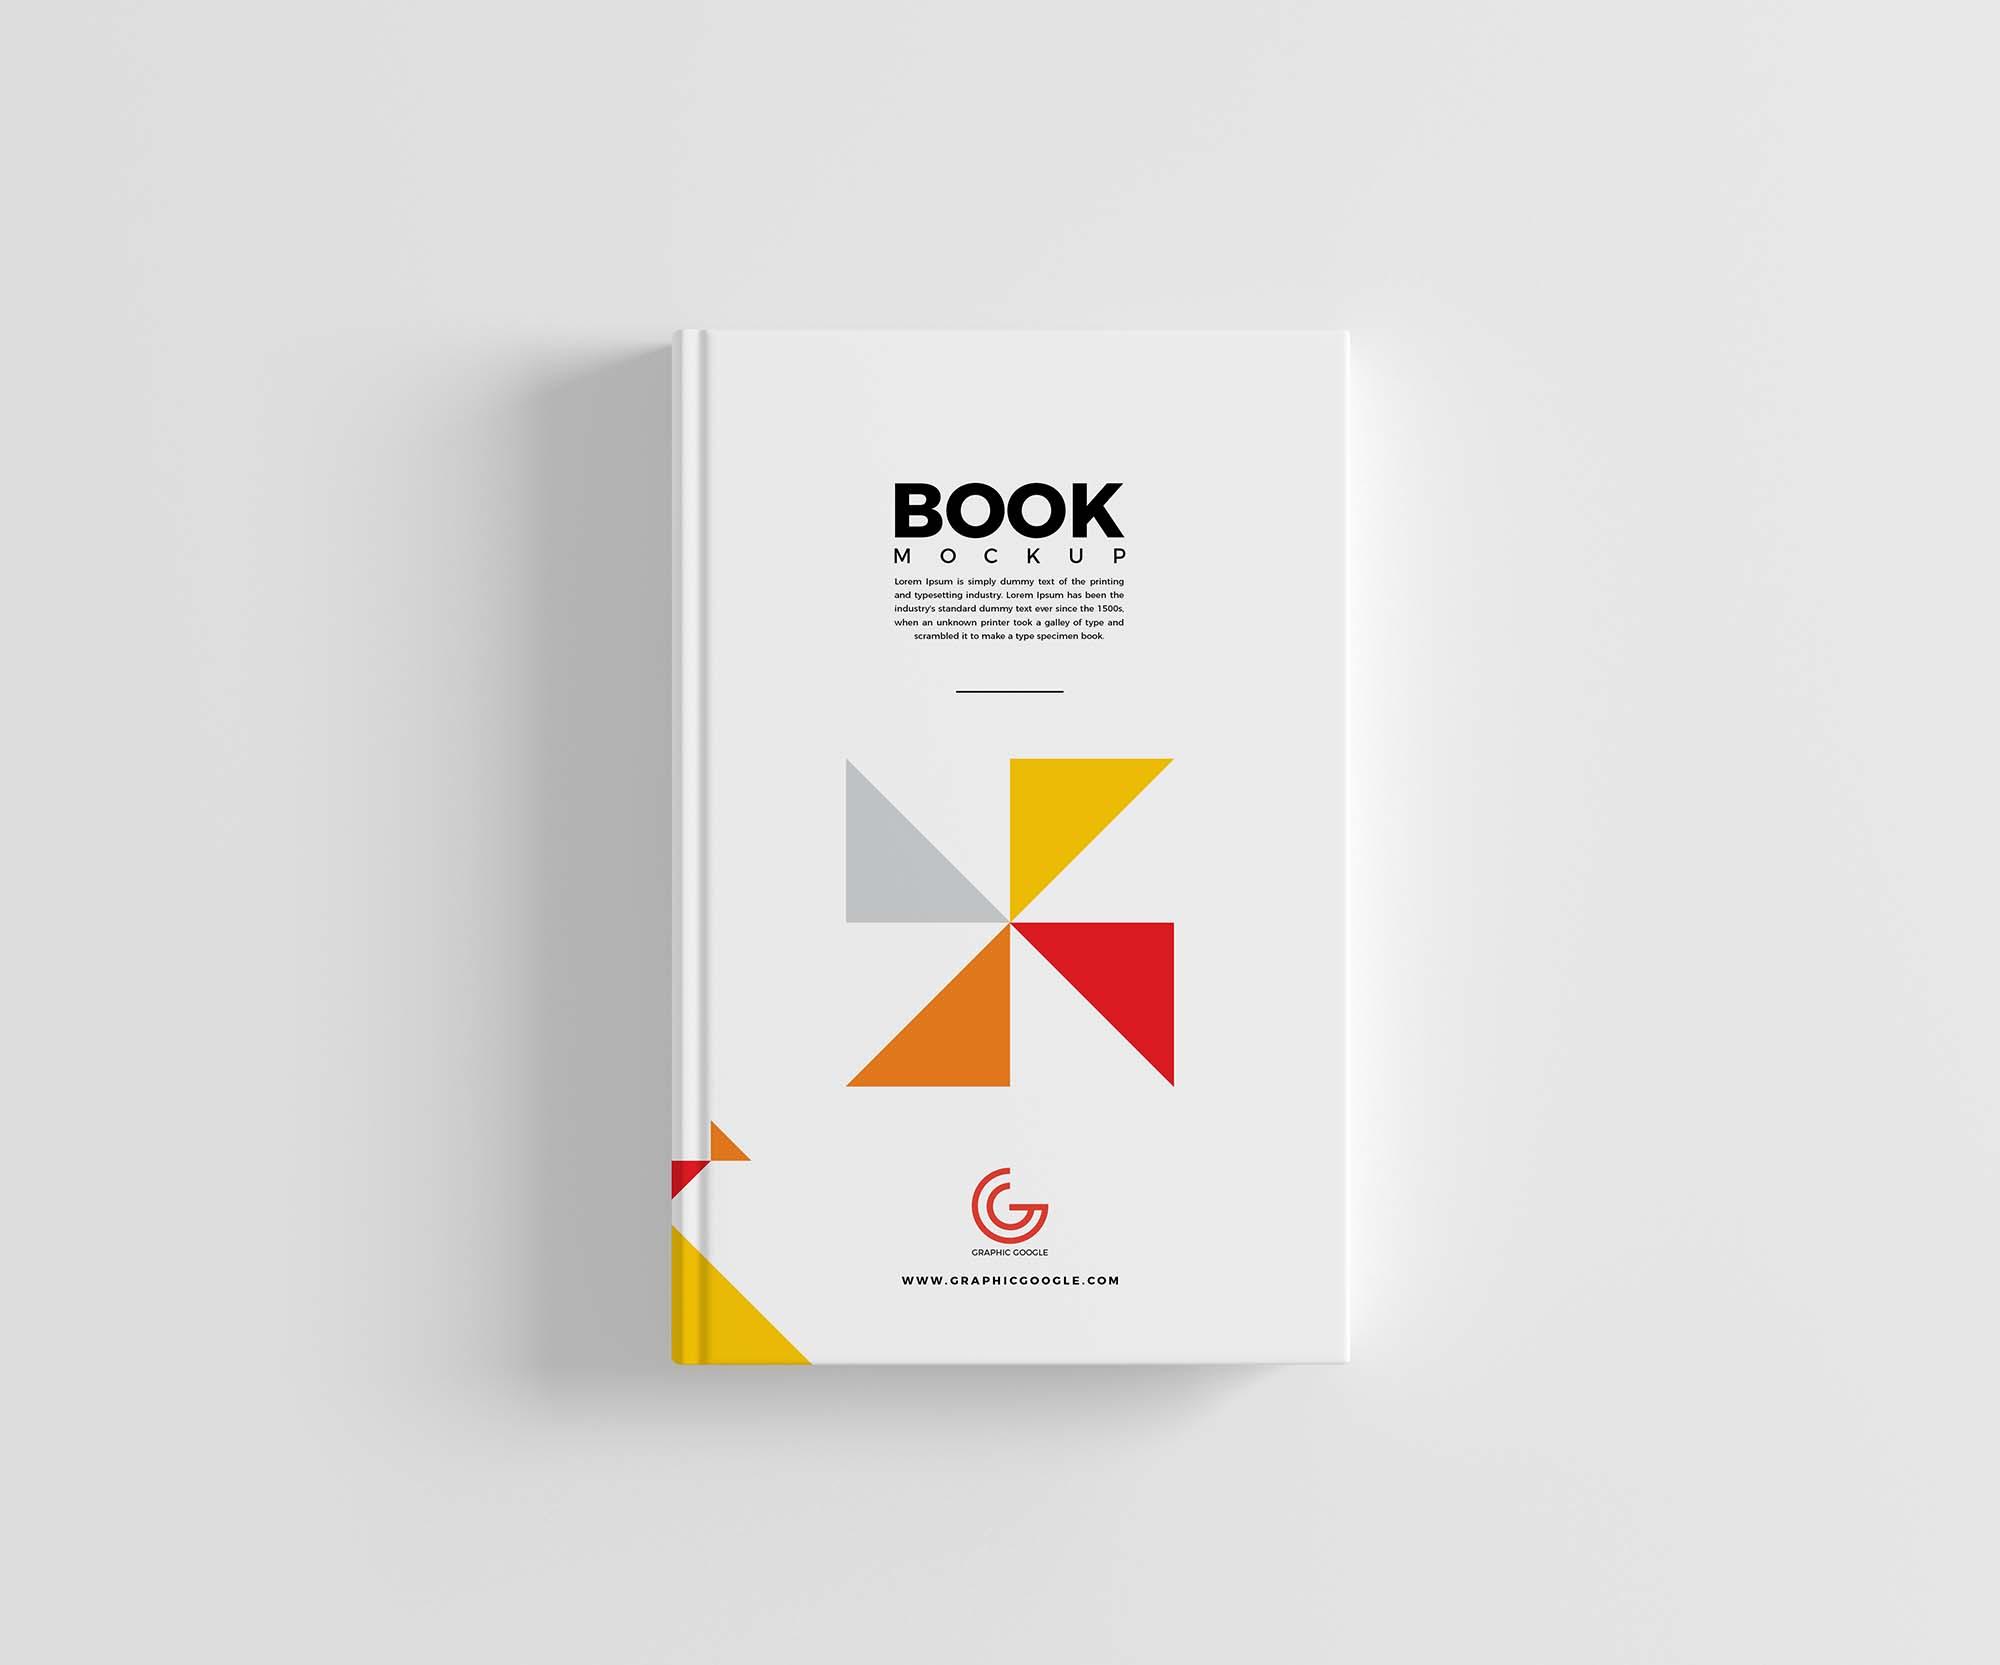 Book Hard Cover Mockup